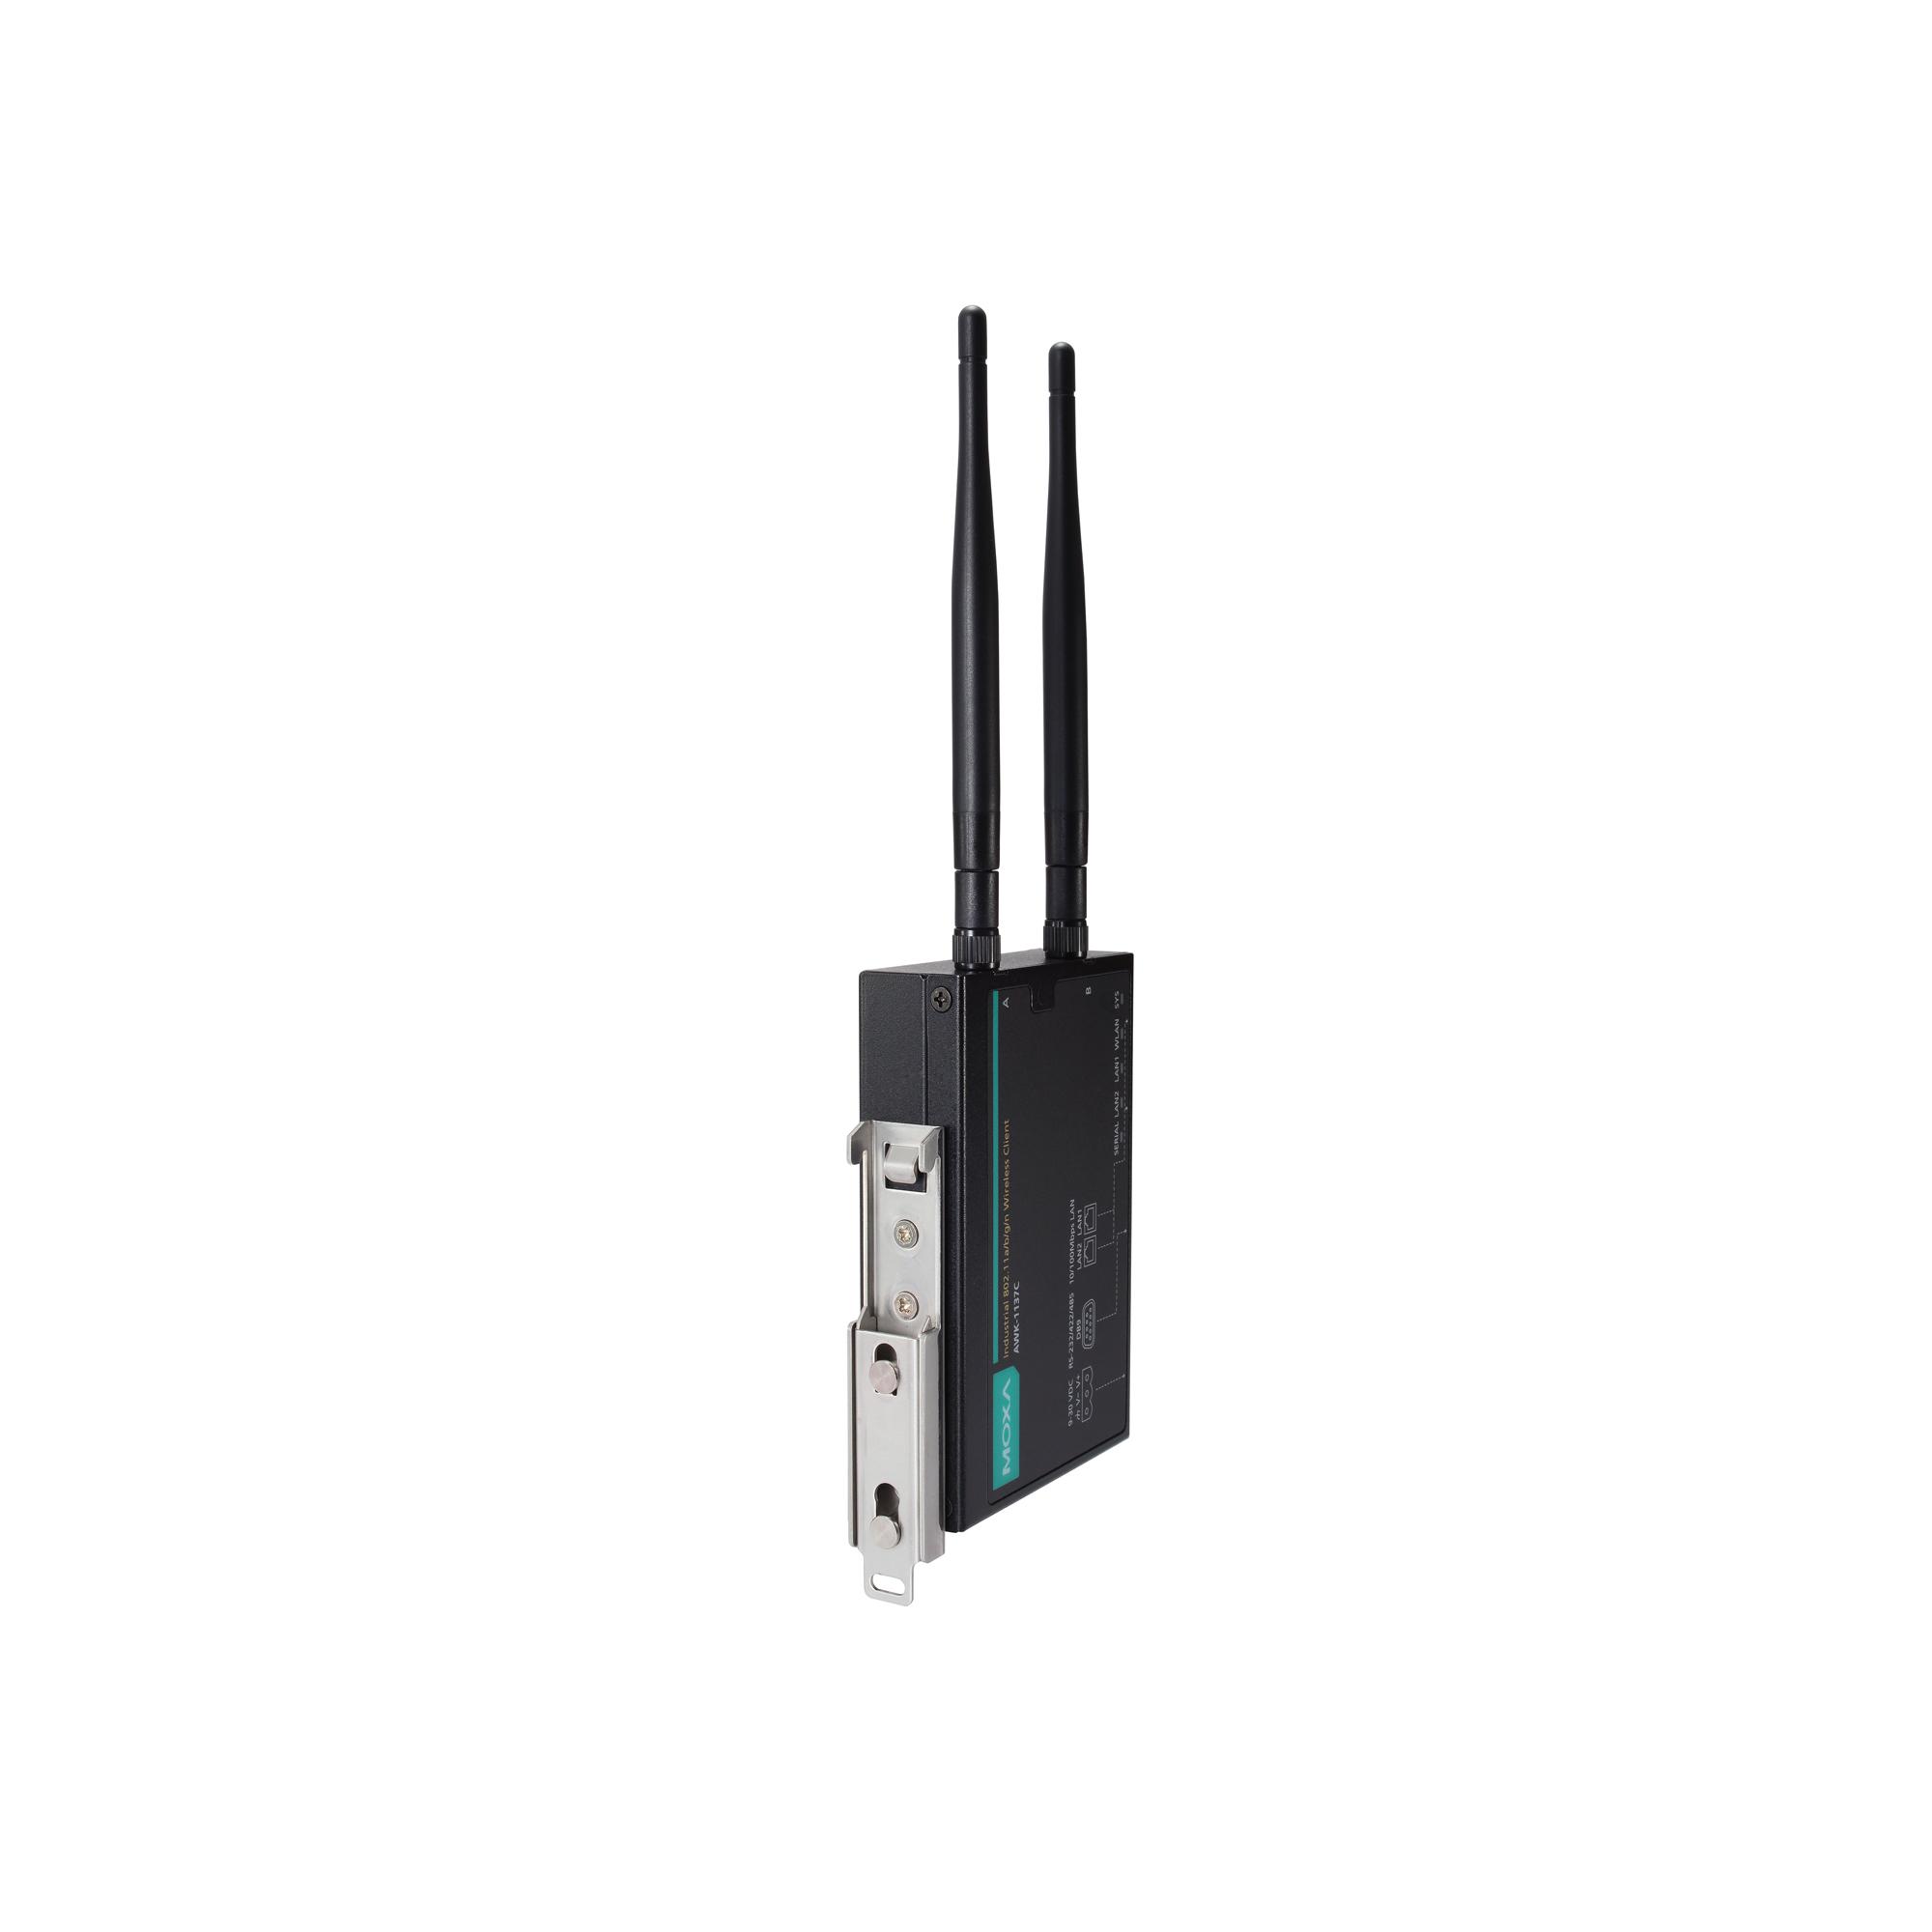 AWK-1137C Series - WLAN AP/Bridge/Client | MOXA